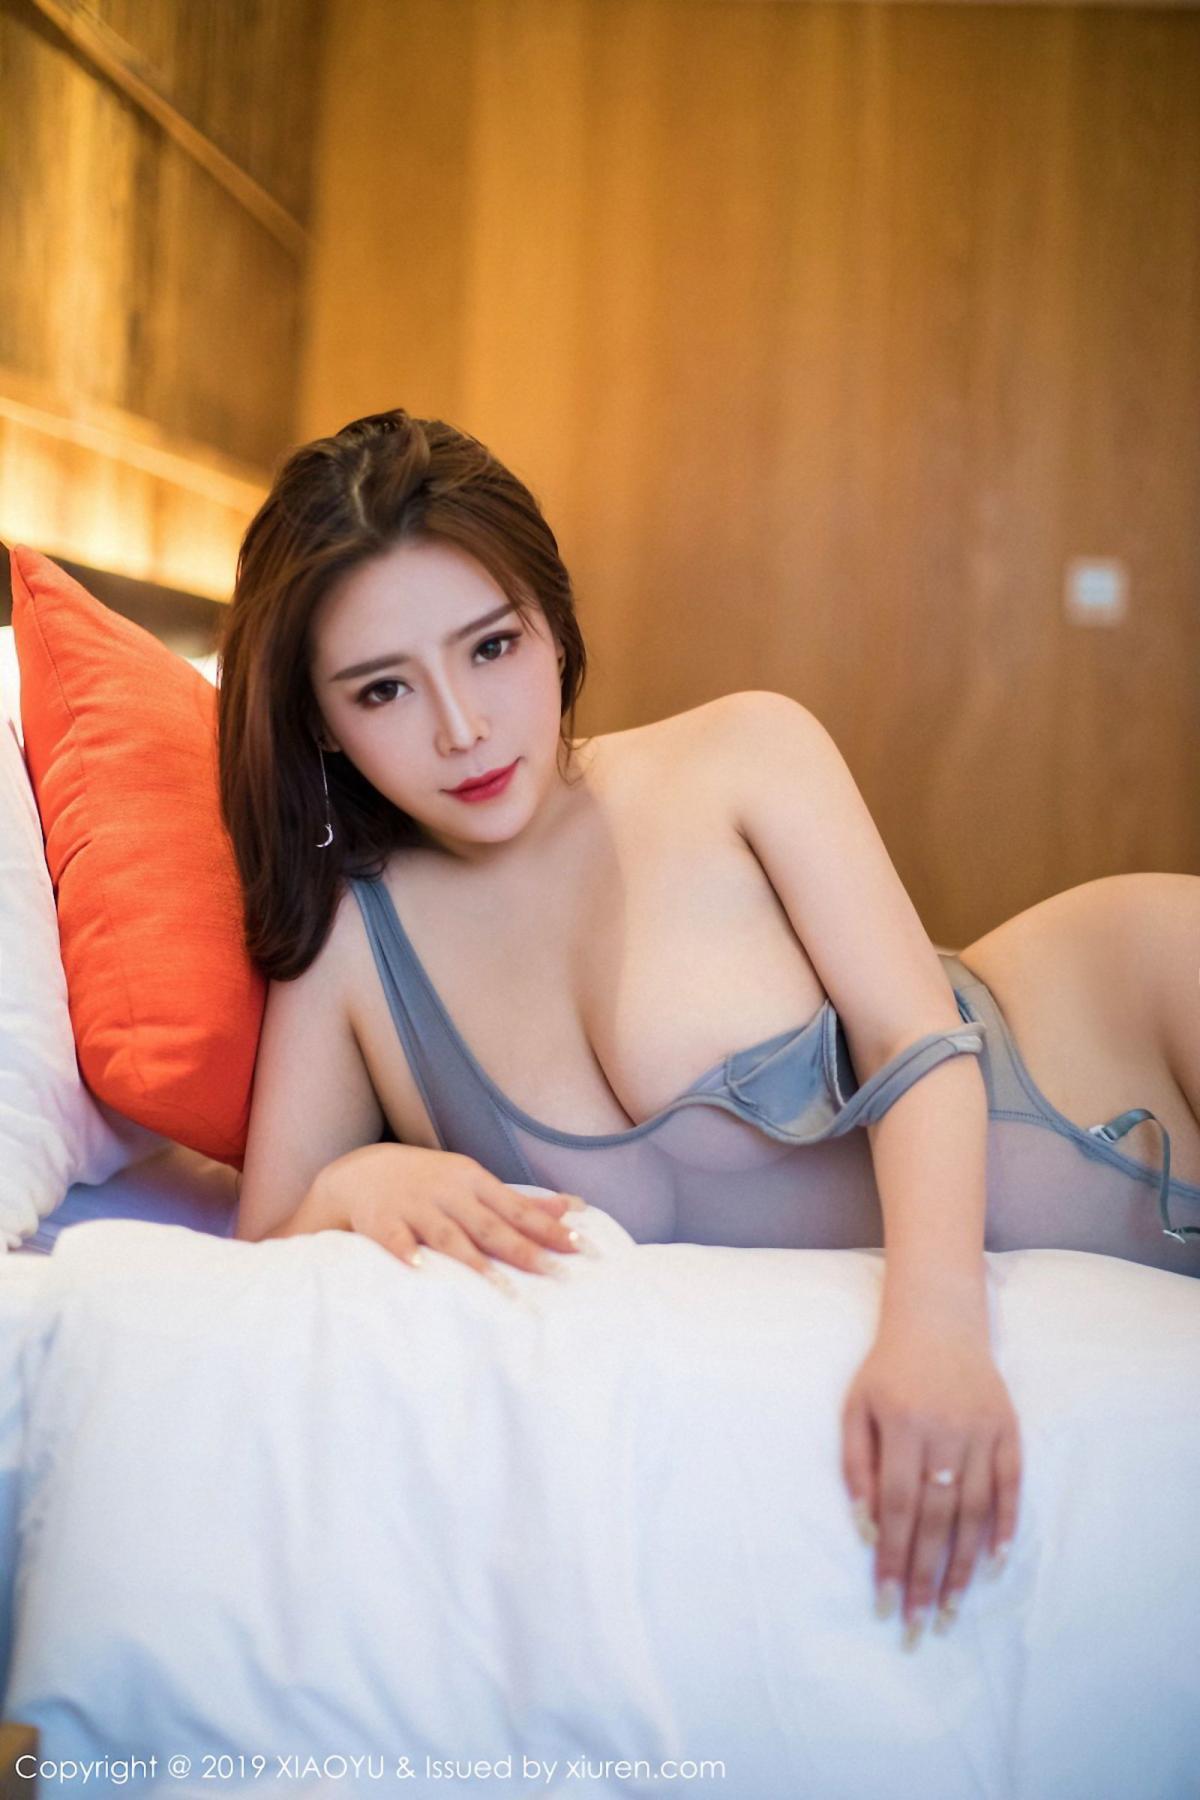 [XiaoYu] Vol.038 Miki Tu 43P, Miki Tu, XiaoYu